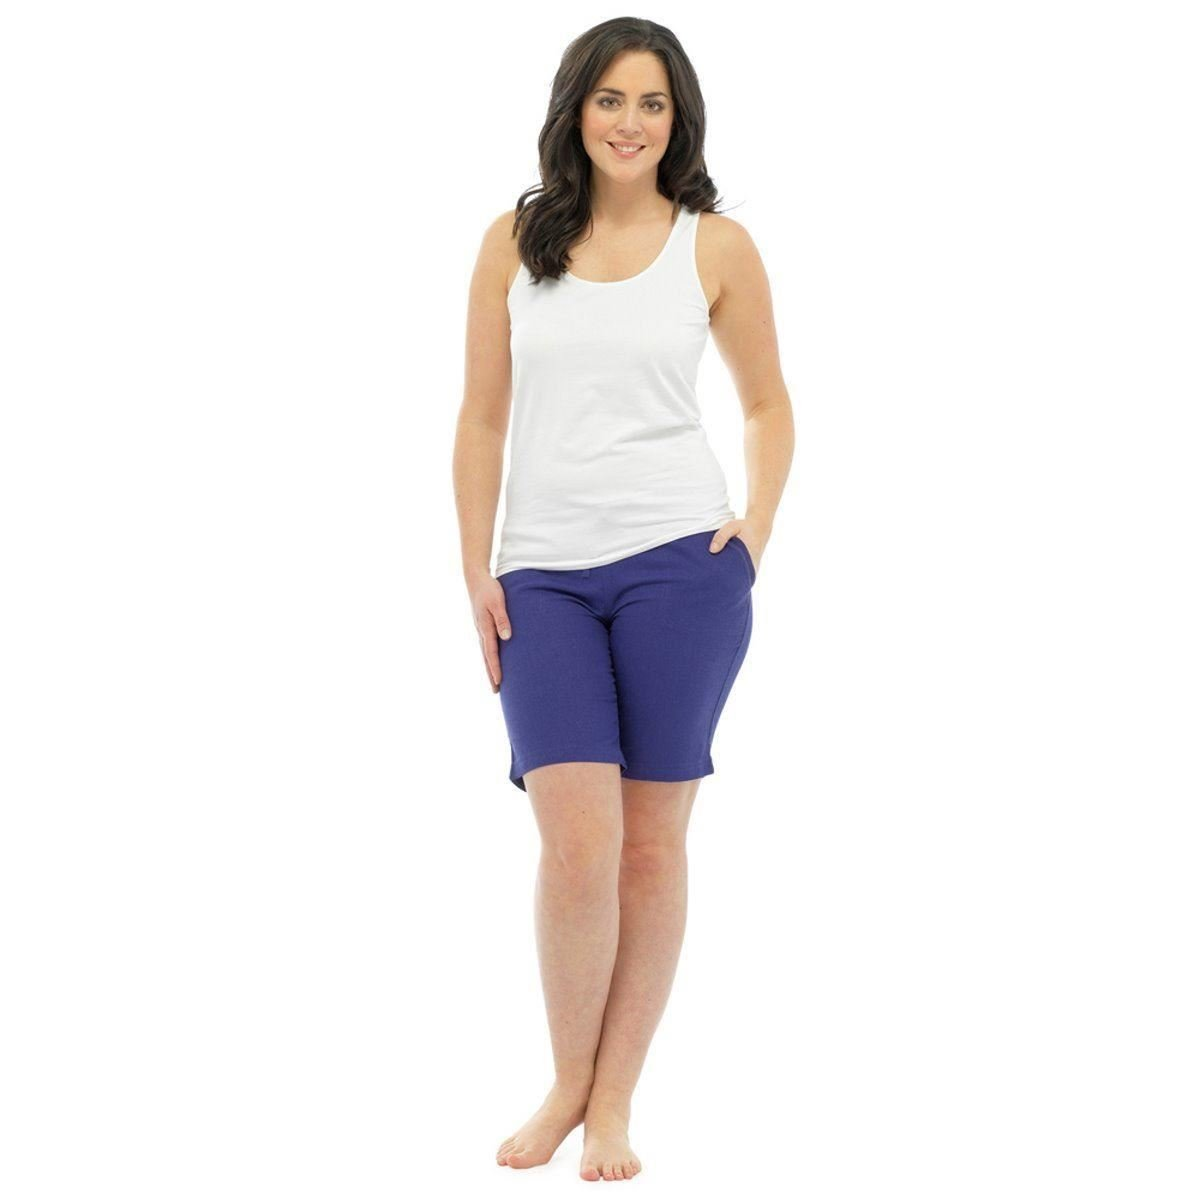 Womens Linen Shorts With Elasticated Waist Holiday Beach Hot Pants Girls Size Damenmode